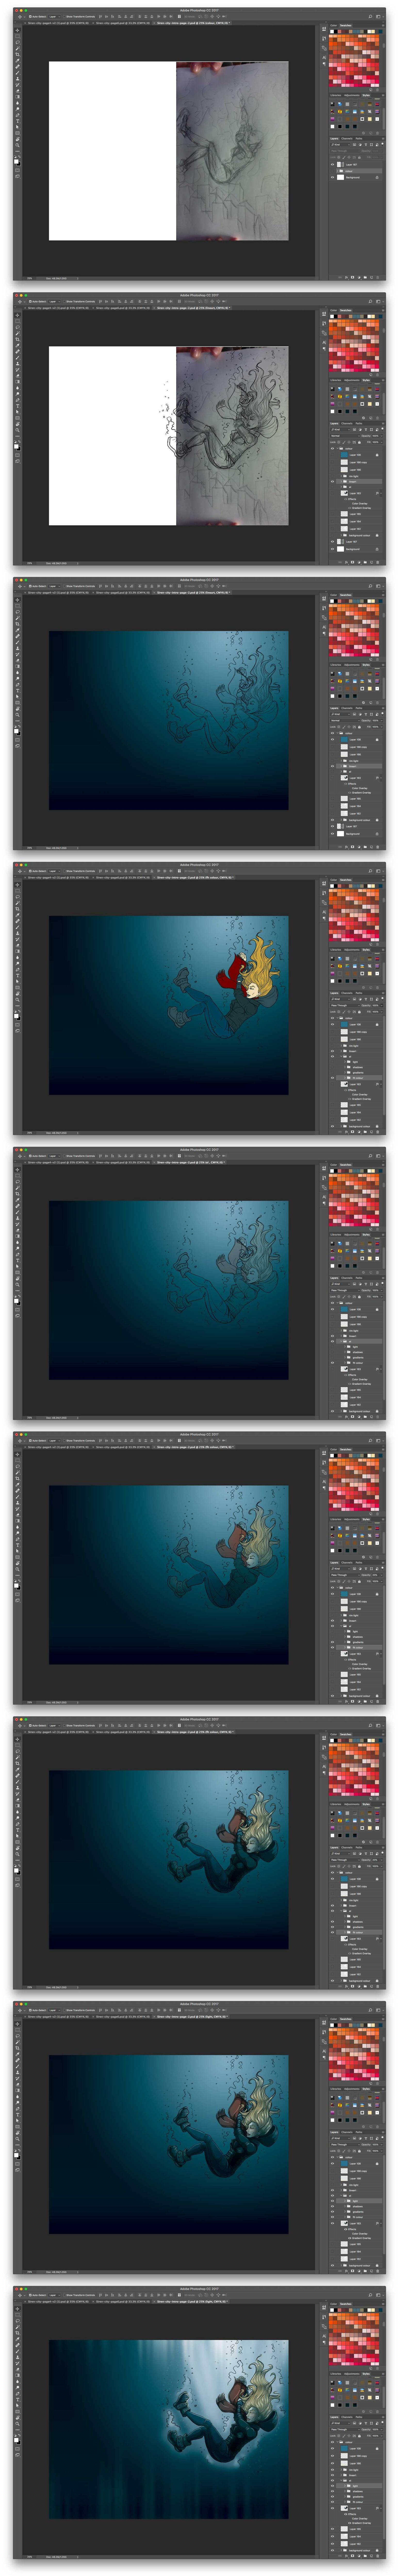 process-shot.jpg